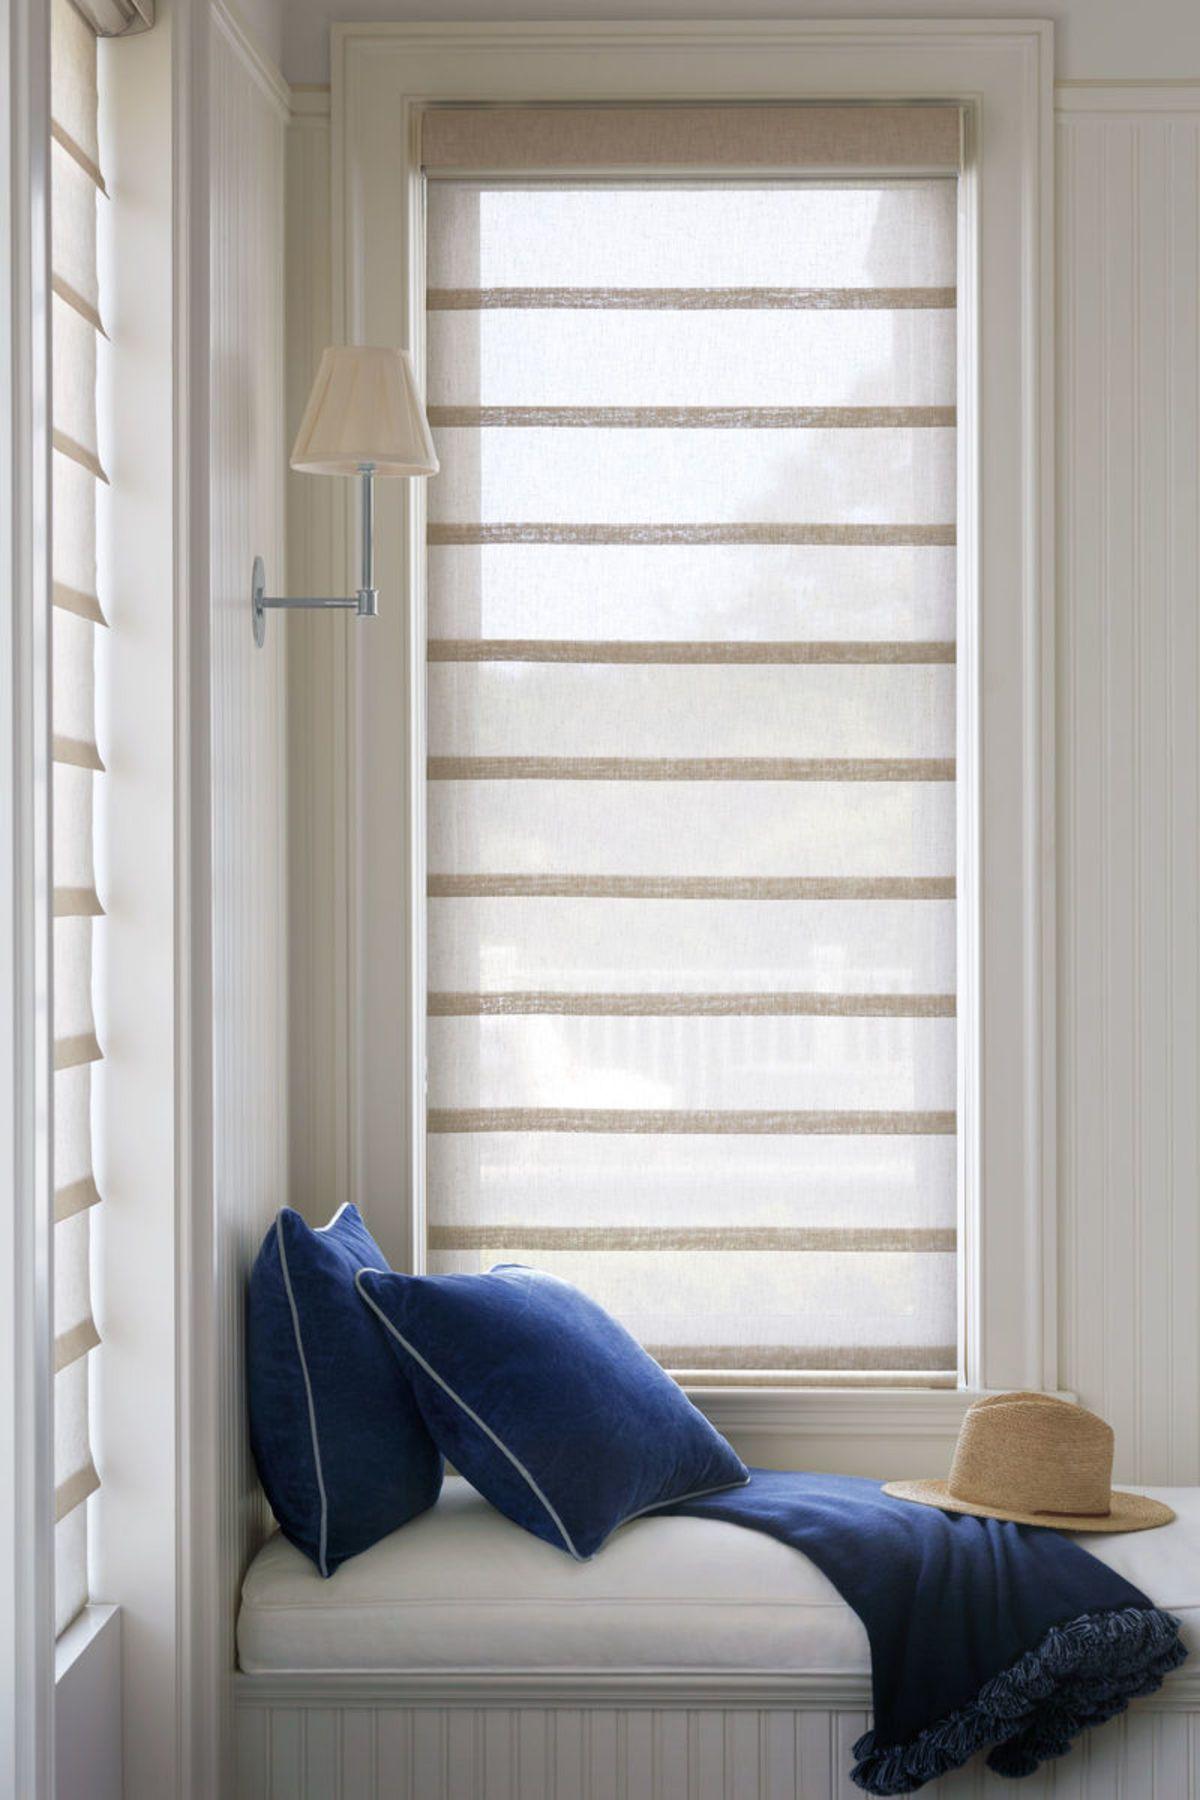 Vignette Modern Roman Shades Modern Roman Shades Living Room Windows Hunter Douglas